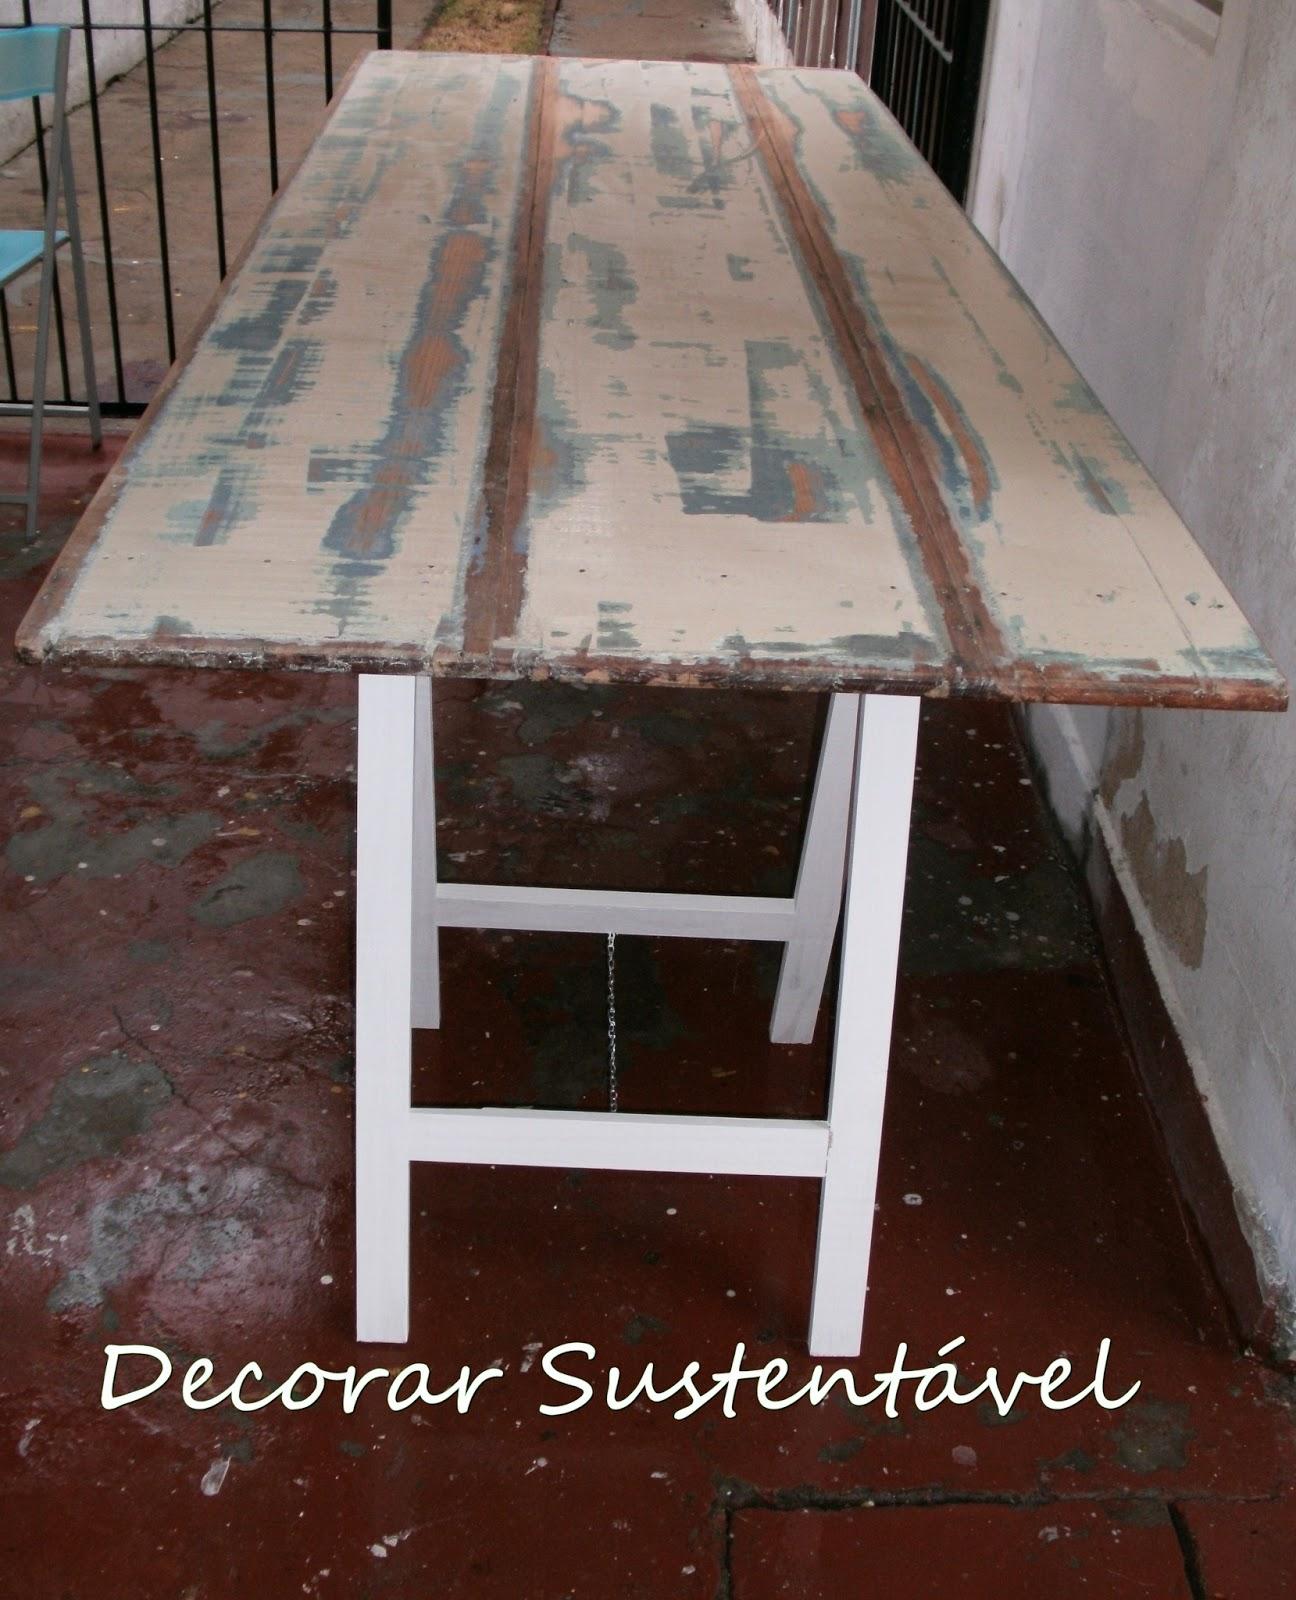 decorar sustentável: Mesa feita de tábuas e cavaletes #361F18 1296x1600